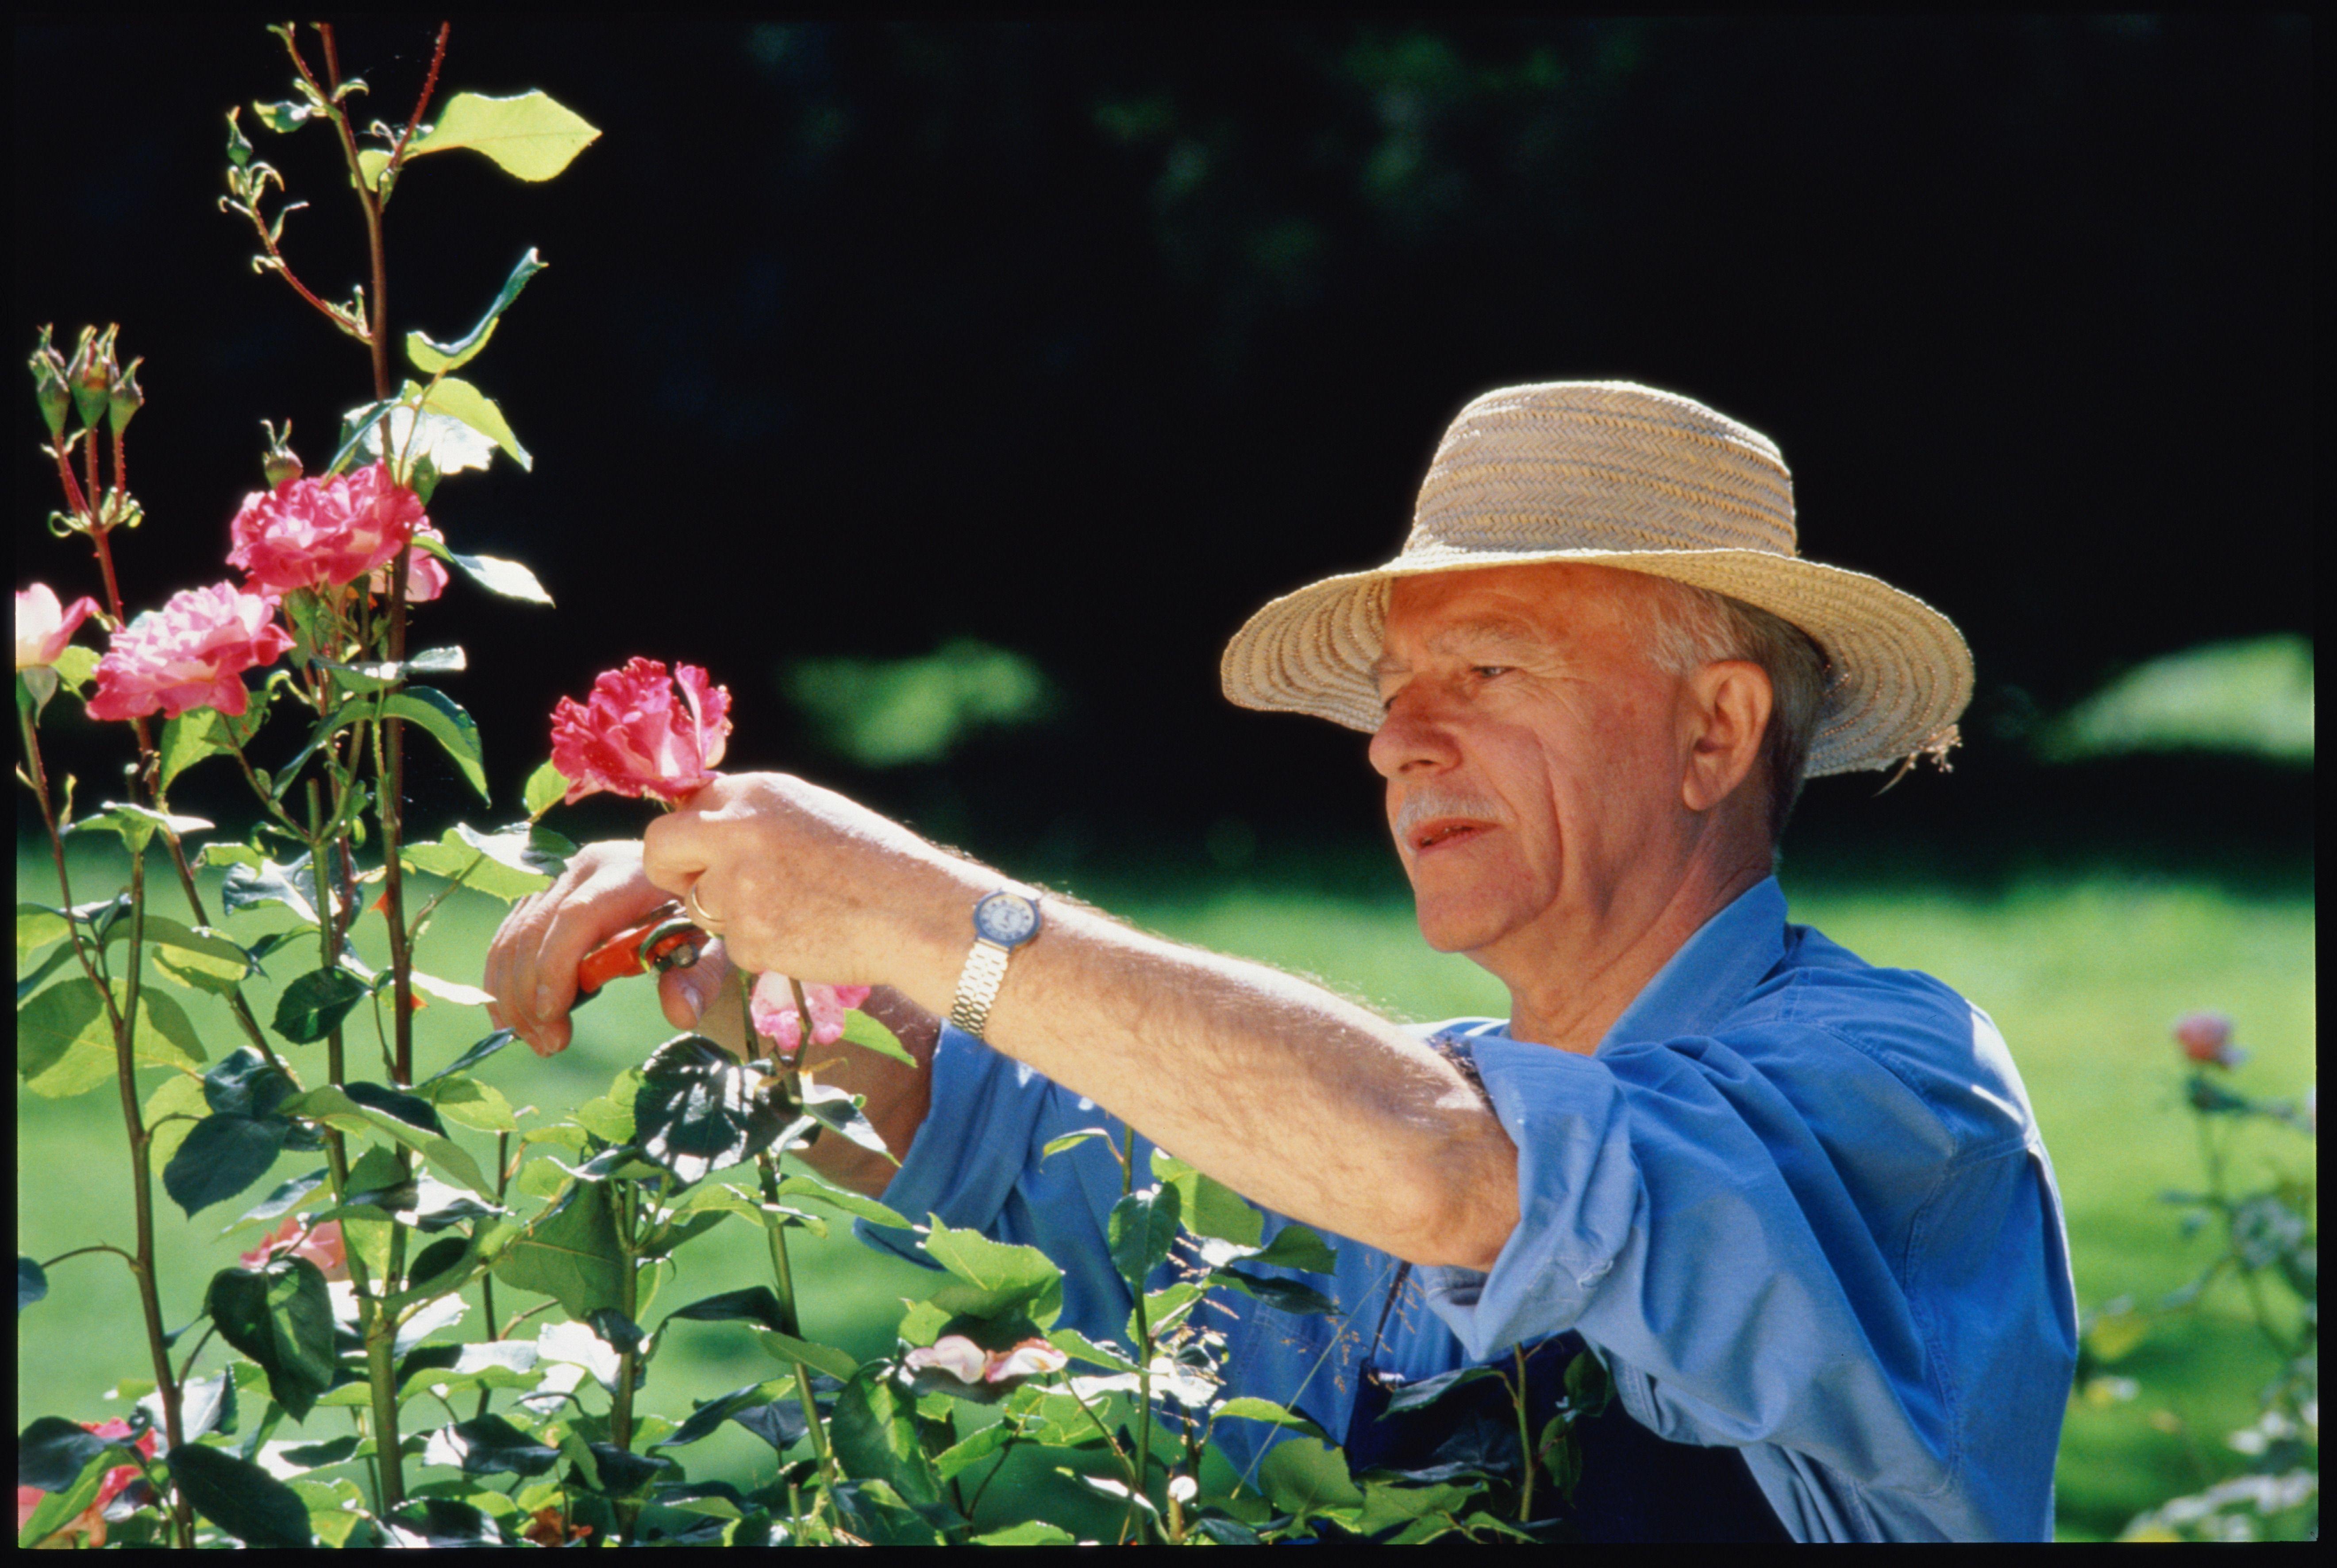 Portrait of elderly man in straw hat tending roses in garden